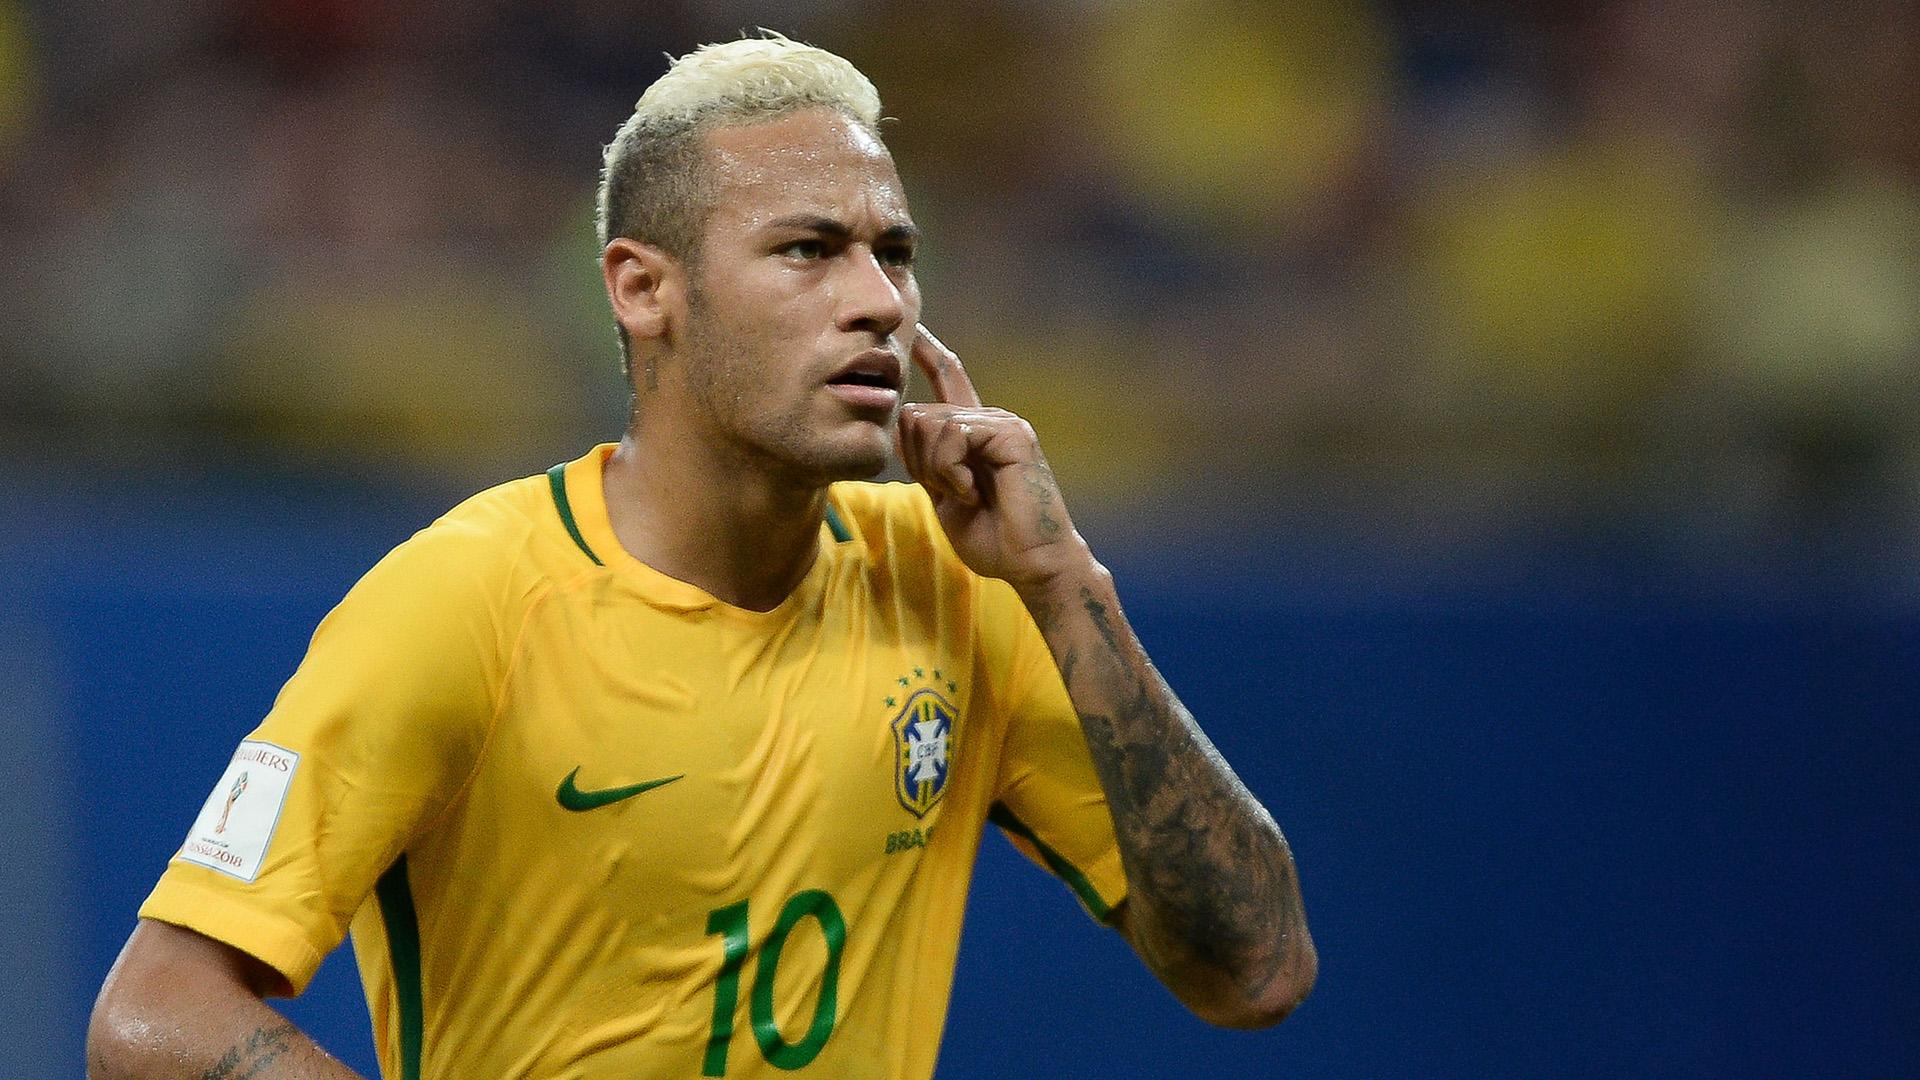 106 días después… Neymar regresa a Barcelona